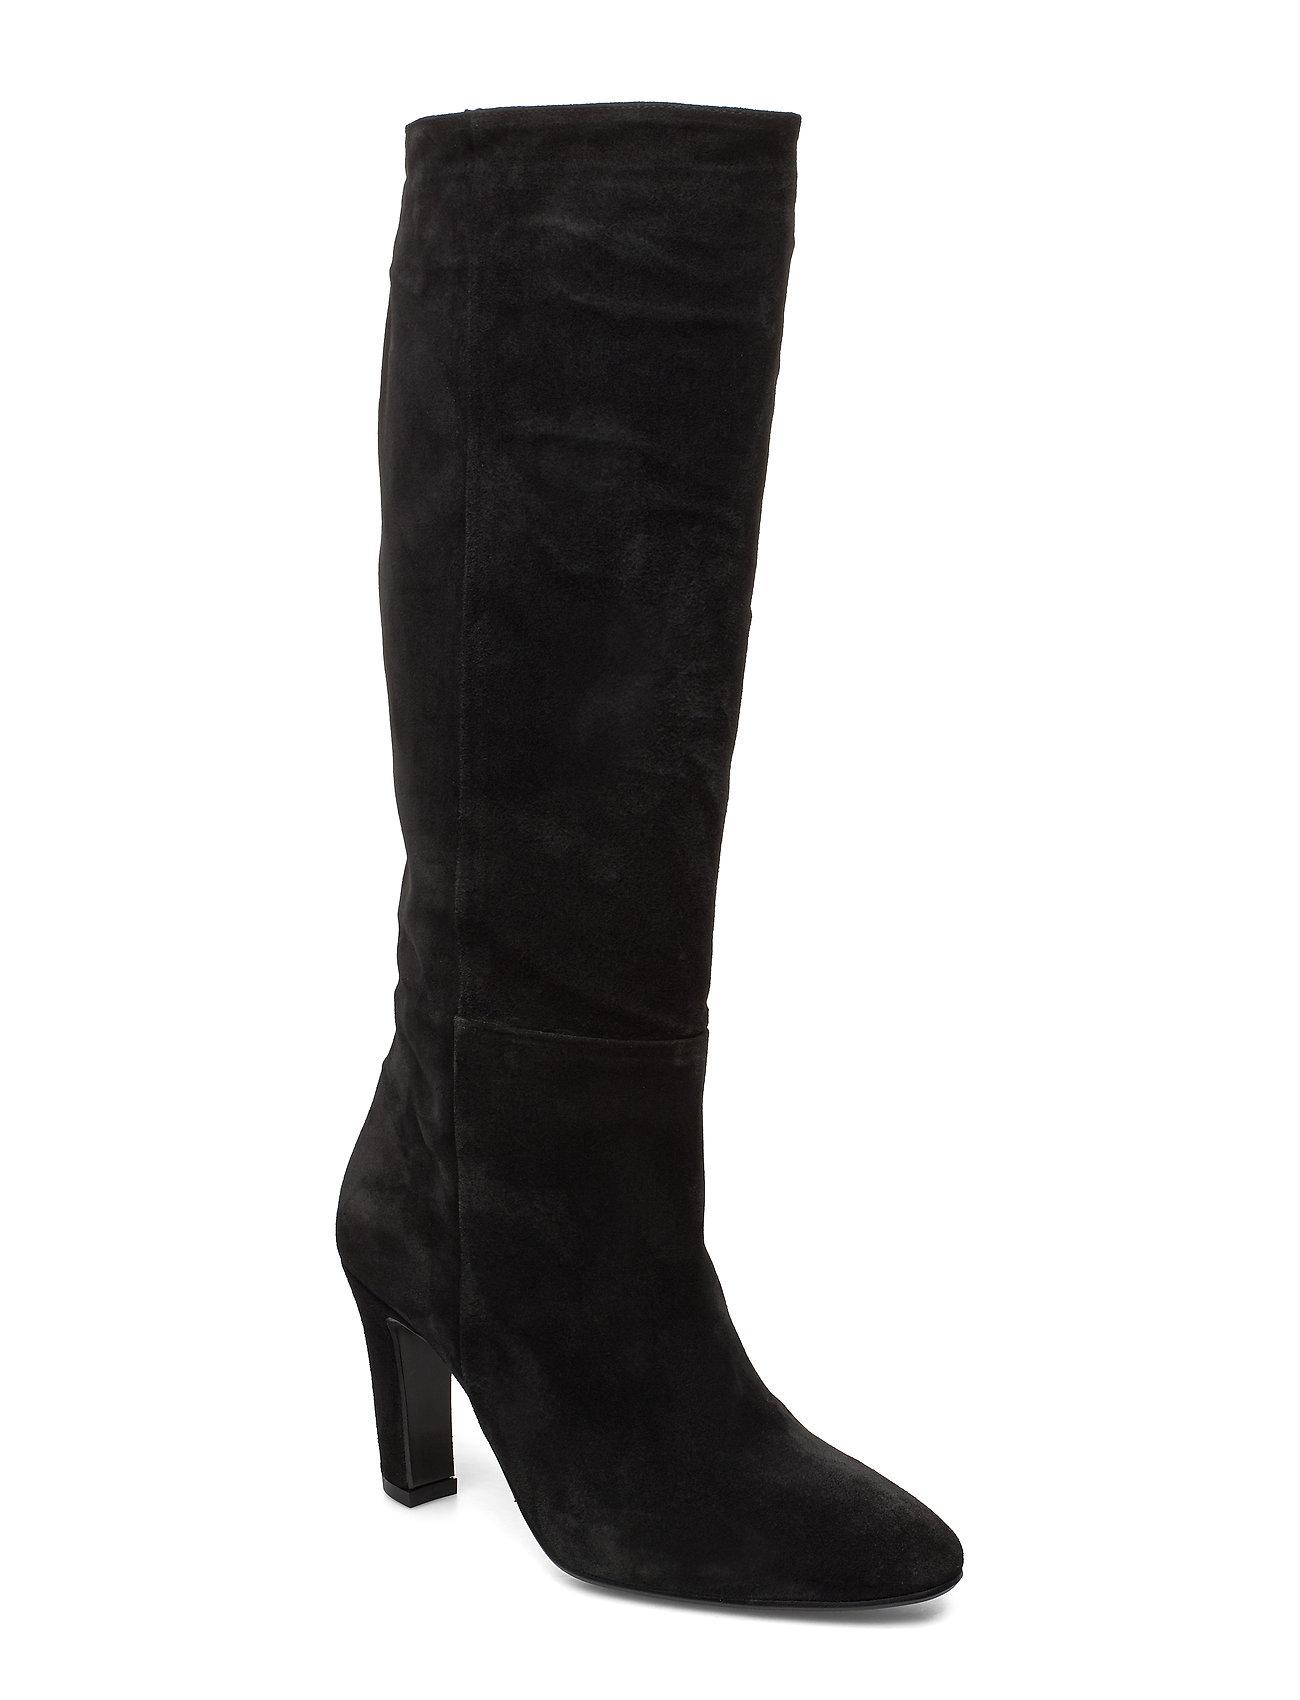 Billi Bi Long Boots 3444 - BLACK BABYSILK SUEDE 500